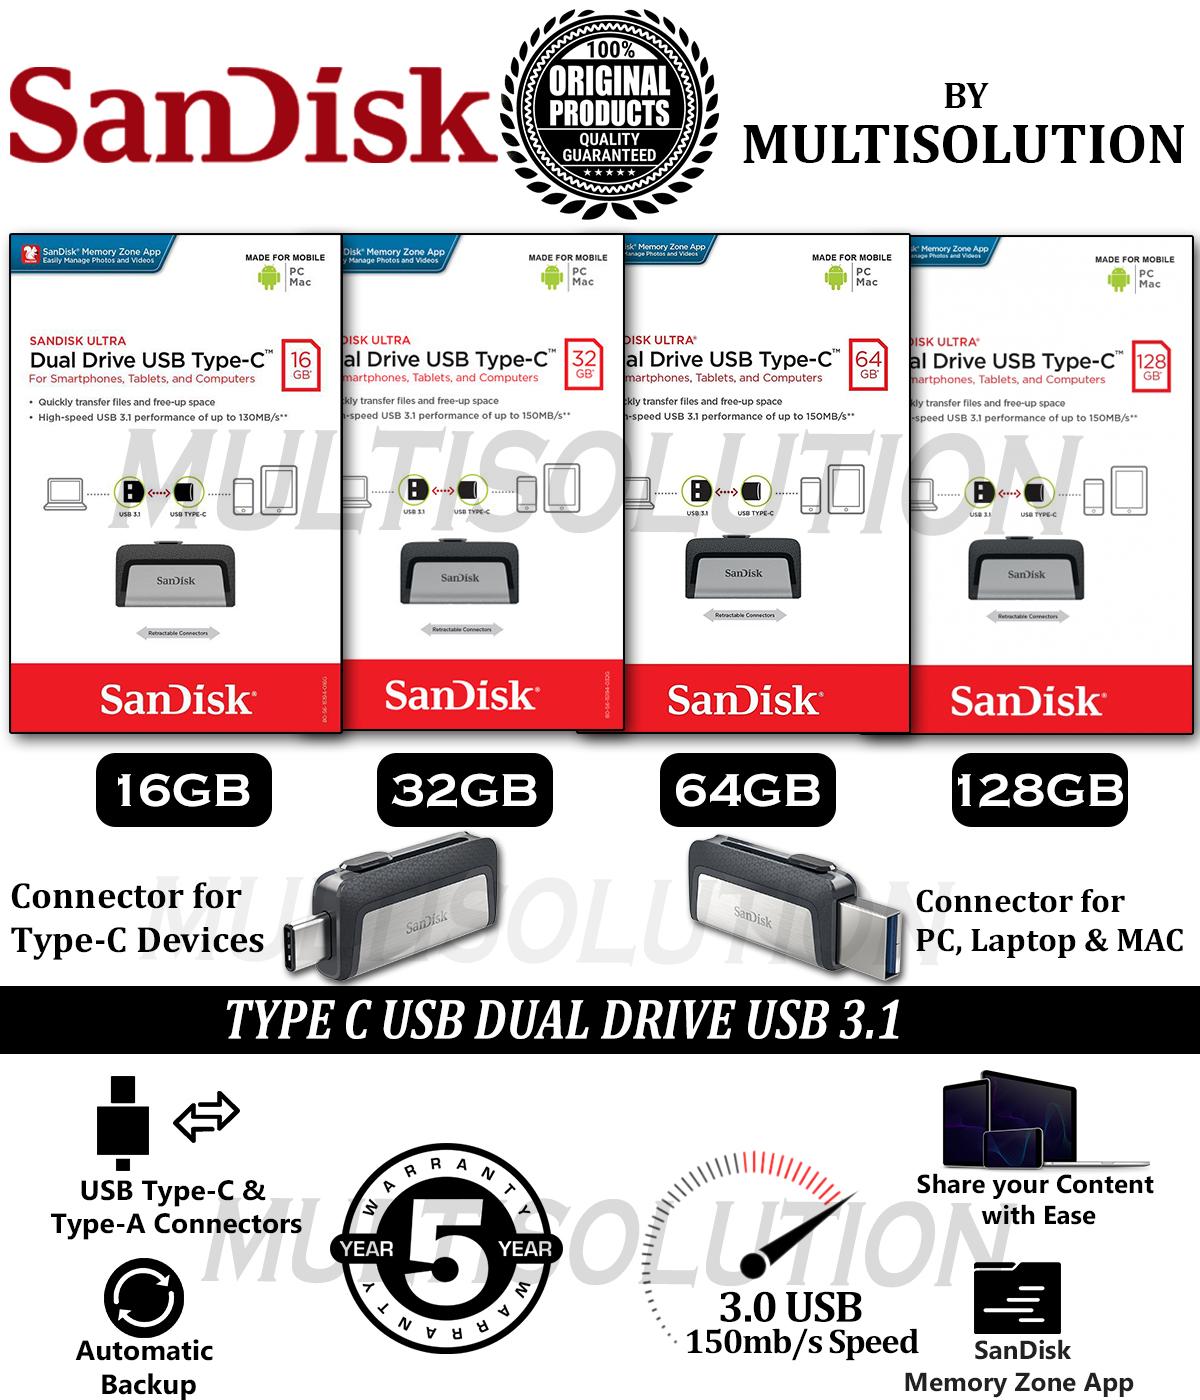 SanDisk Type C Ultra OTG USB Dual Drive 3.1 - OTG - 5 Years Warranty